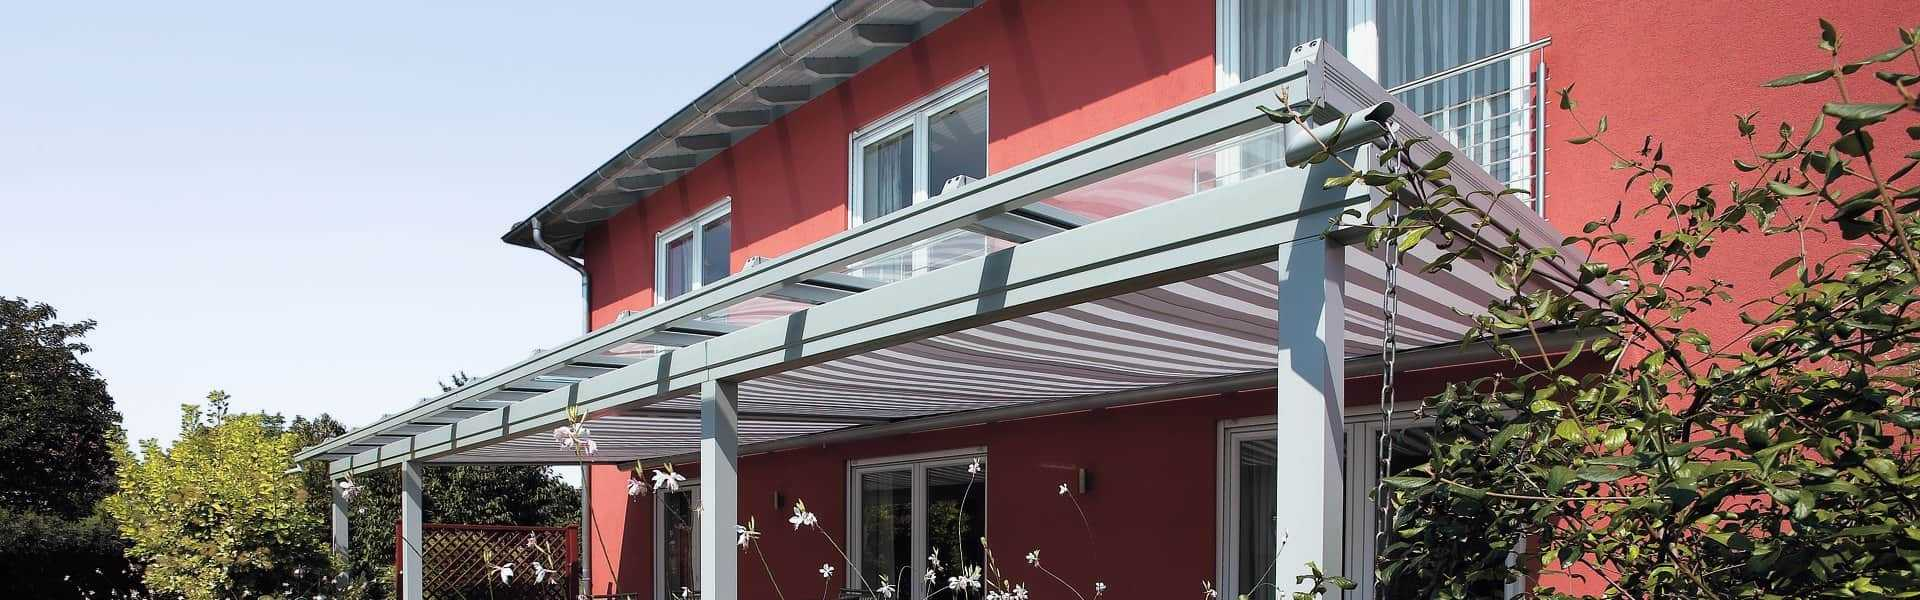 Warema W10 Roof Blind